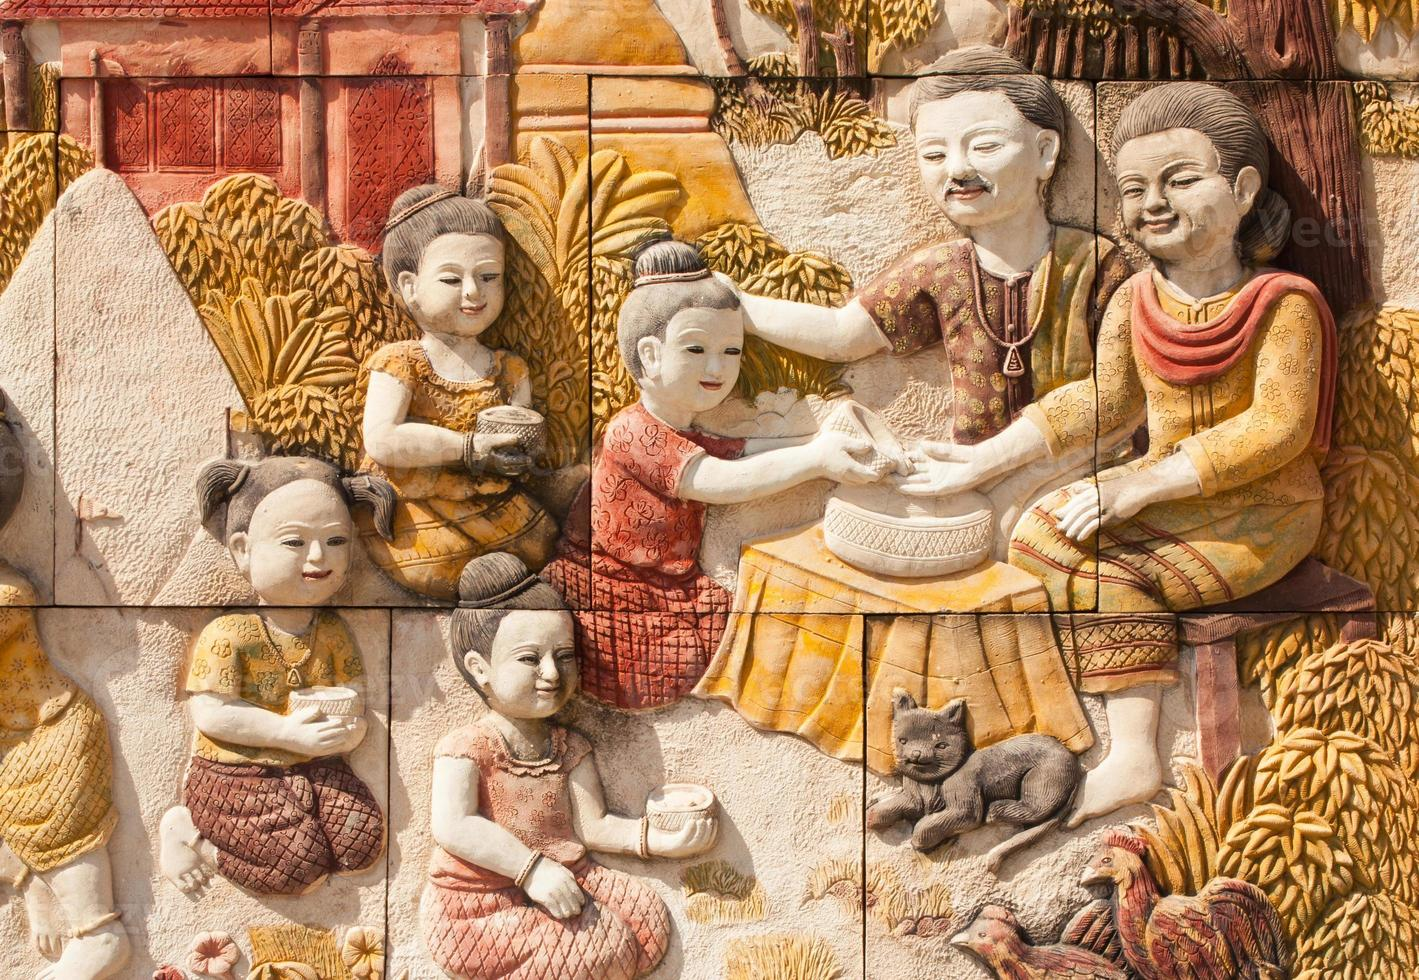 escultura em pedra da cultura tailandesa do festival songkran foto